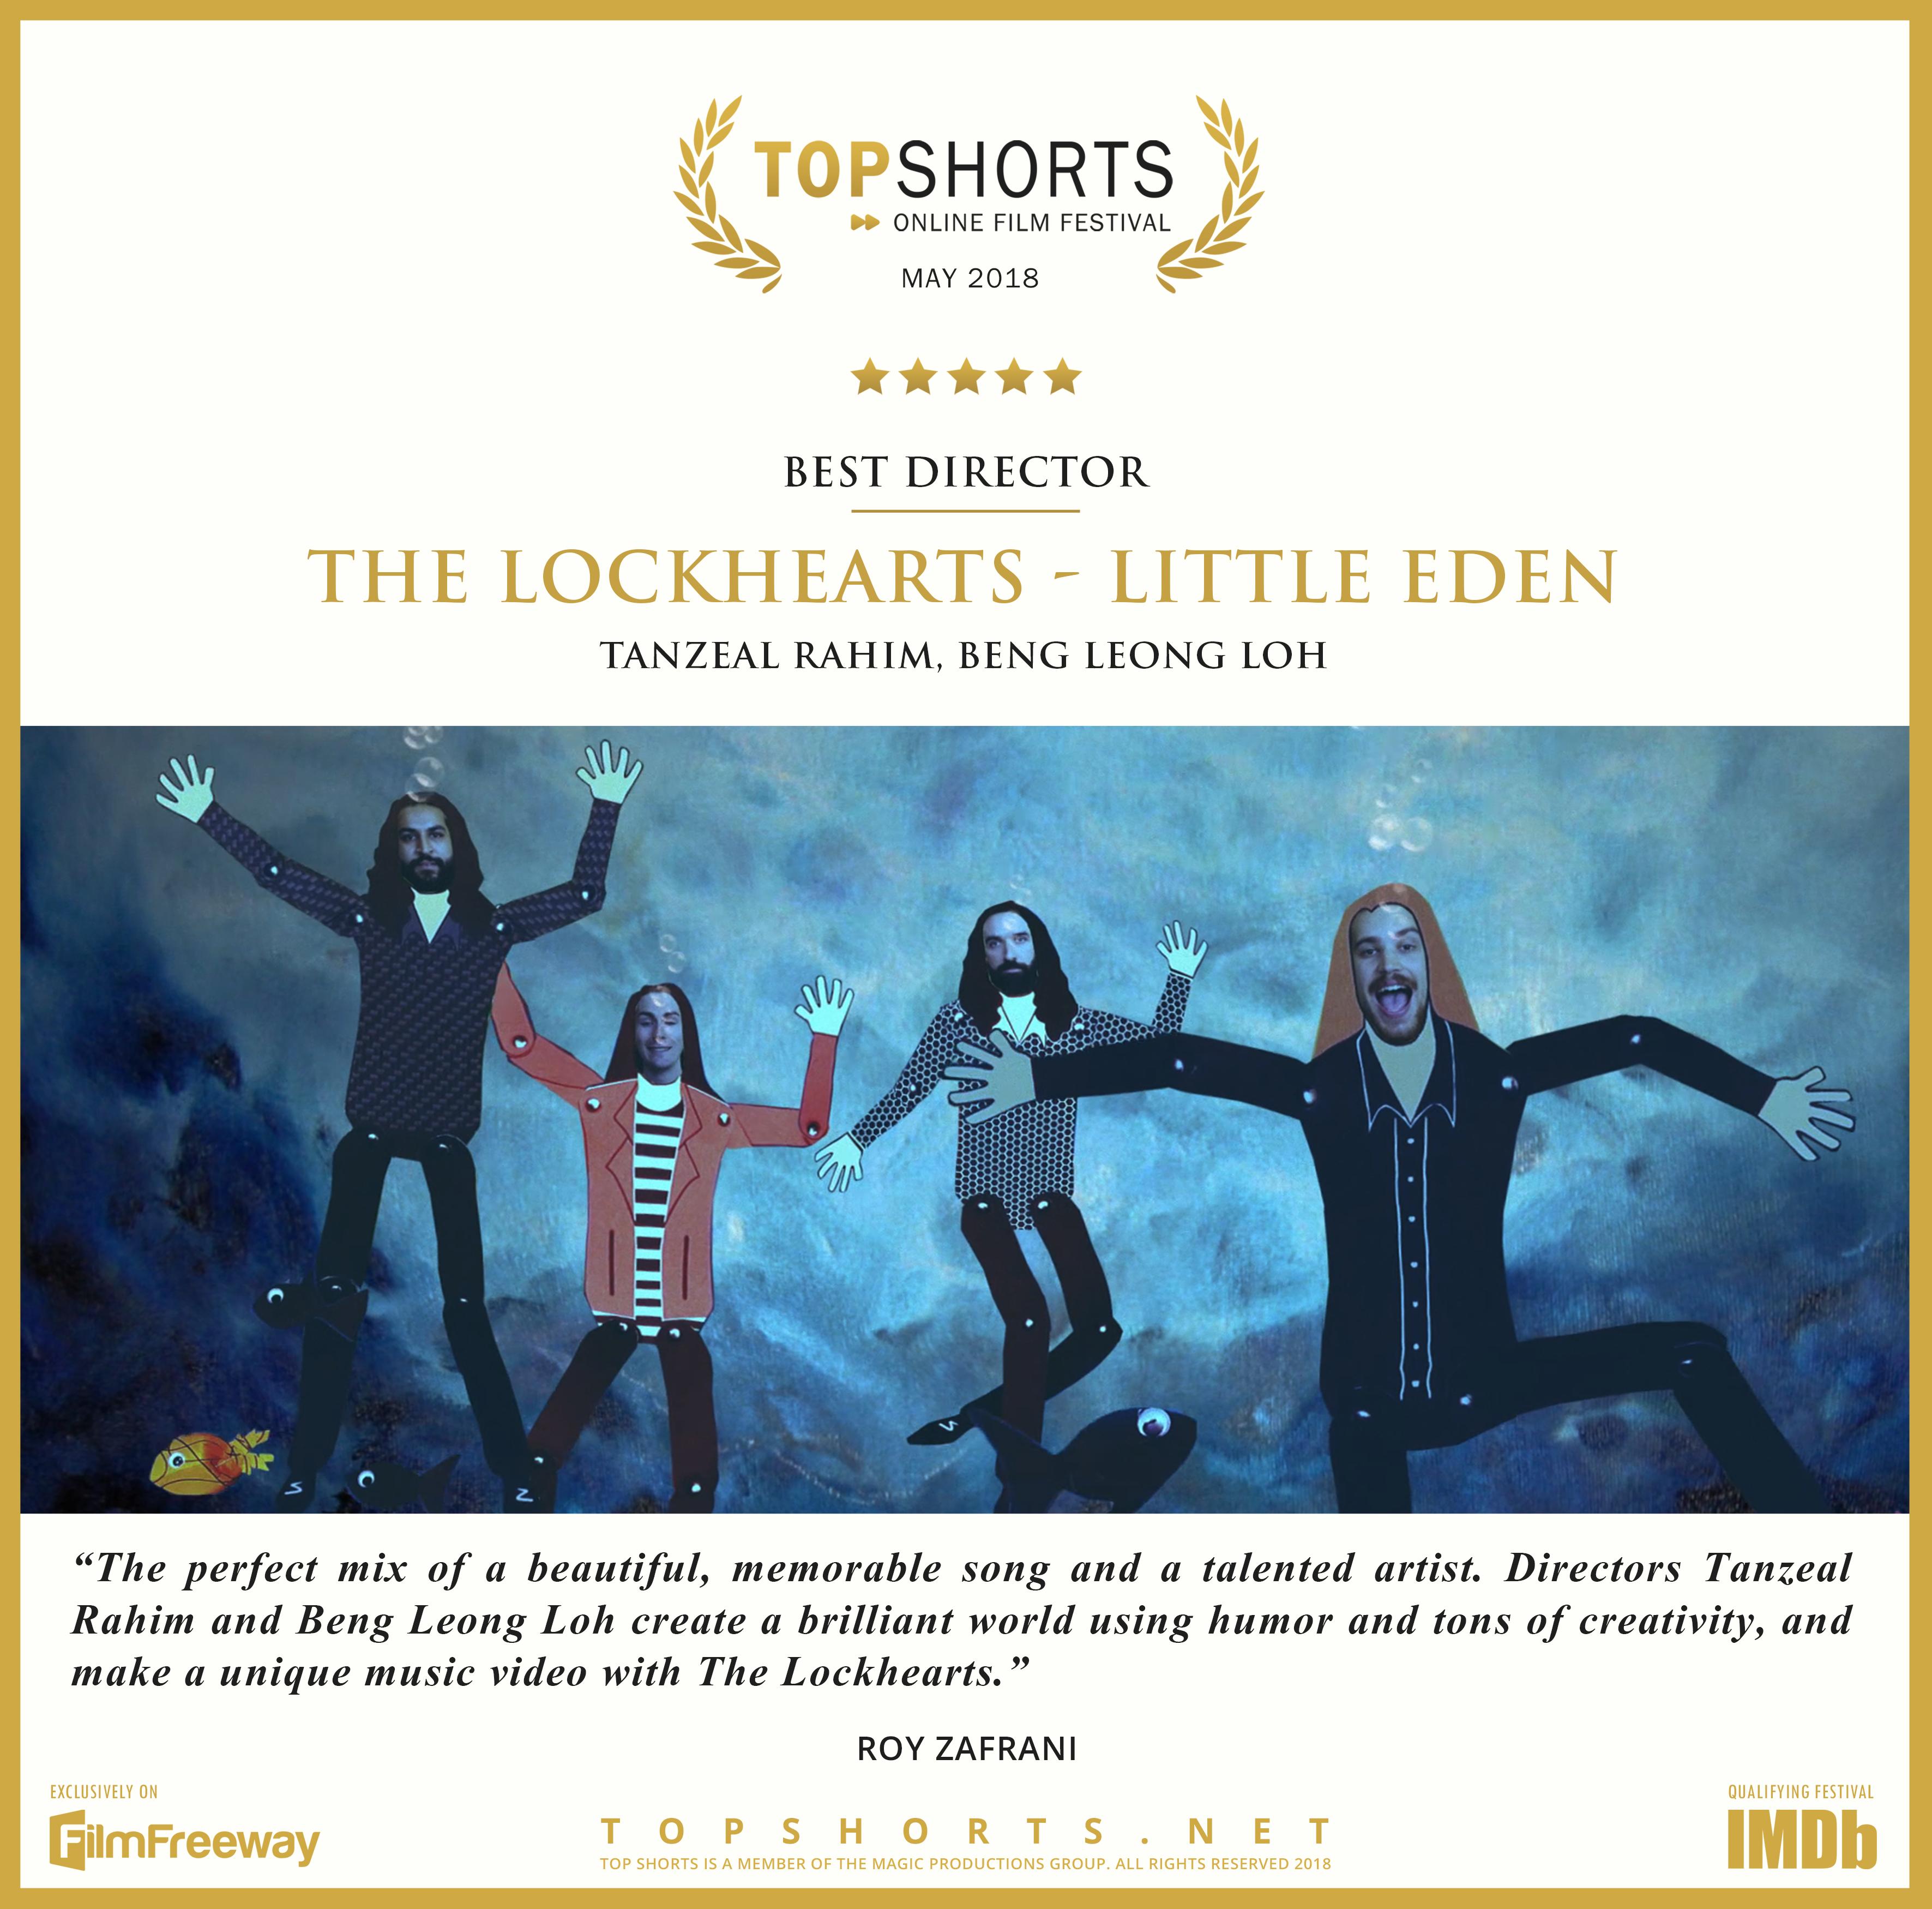 2018 05 Best Director - The Lockhearts - Little Eden